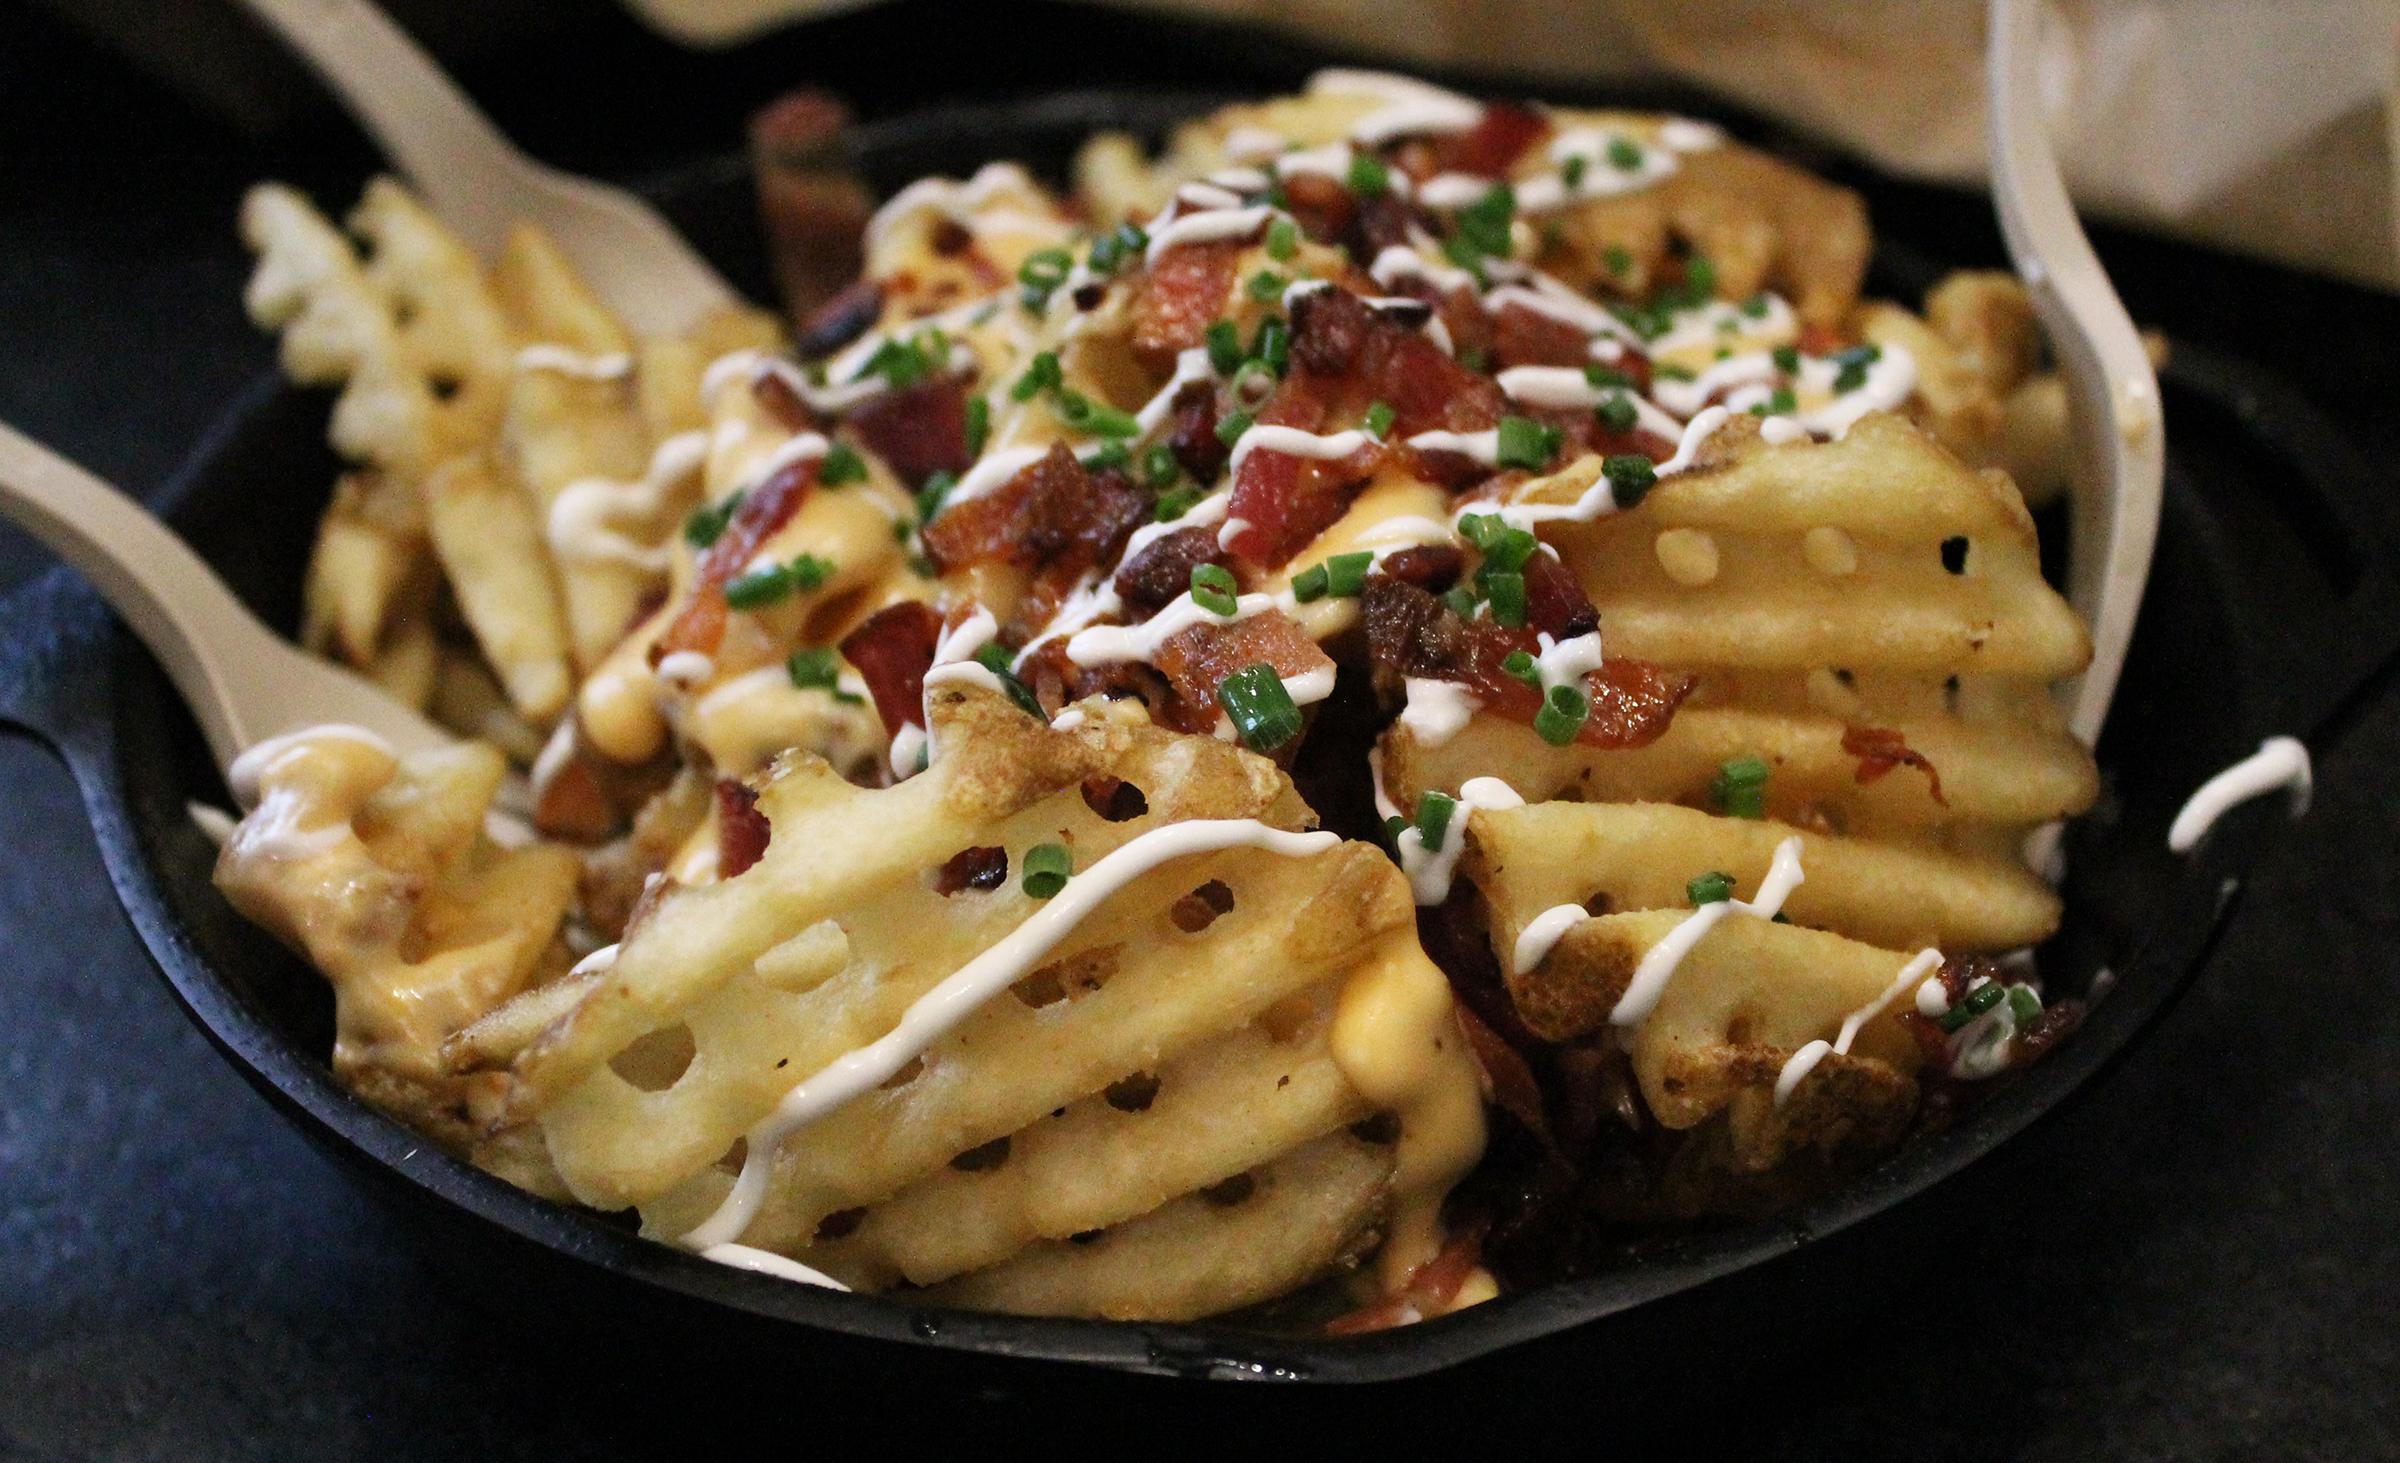 IRISH NACHOS:Waffle Cut Fries, Bruxie Cheese Sauce, Applewood Bacon, Sour Cream, Chives